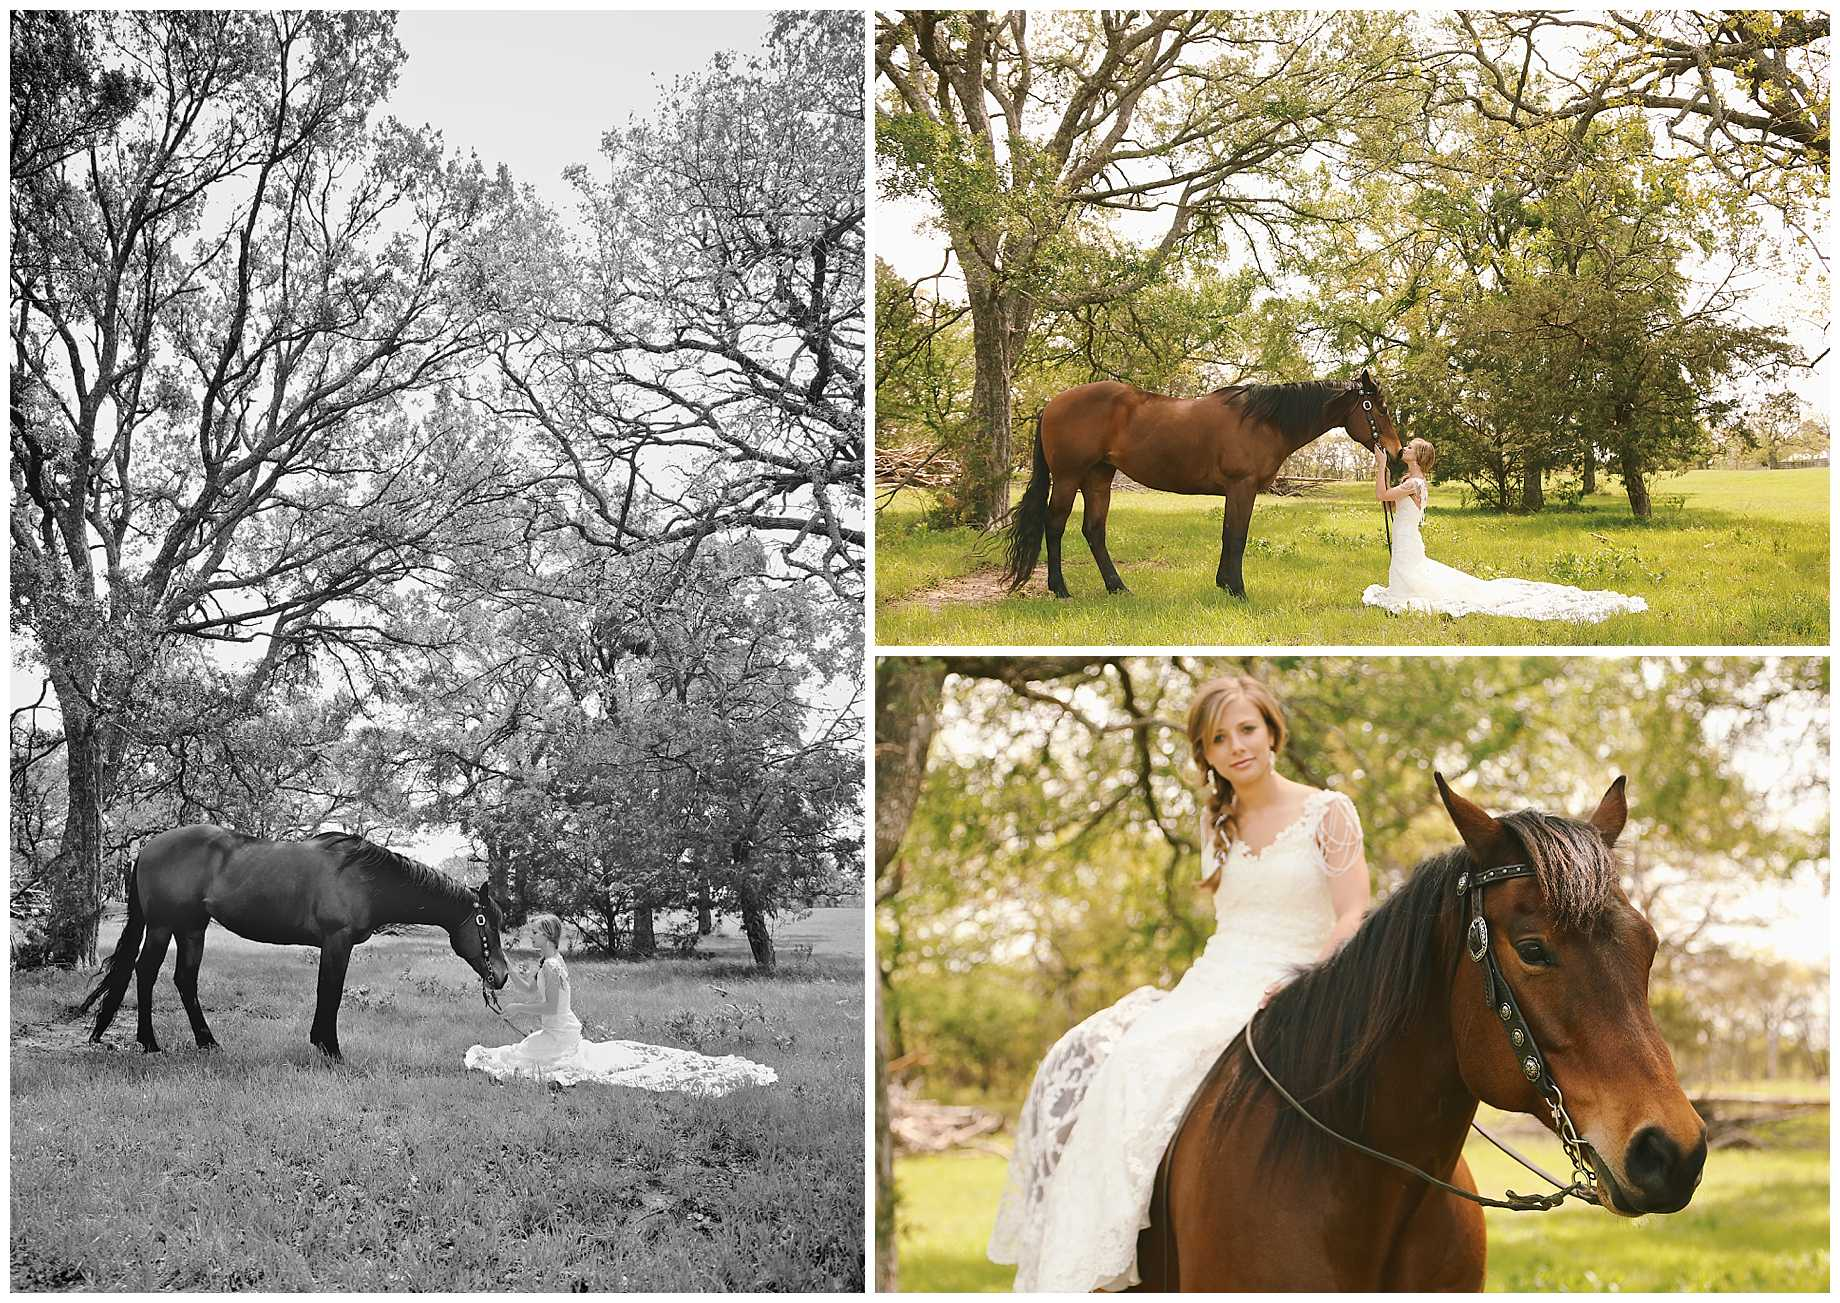 bride-on-a-horse-east-texas-09